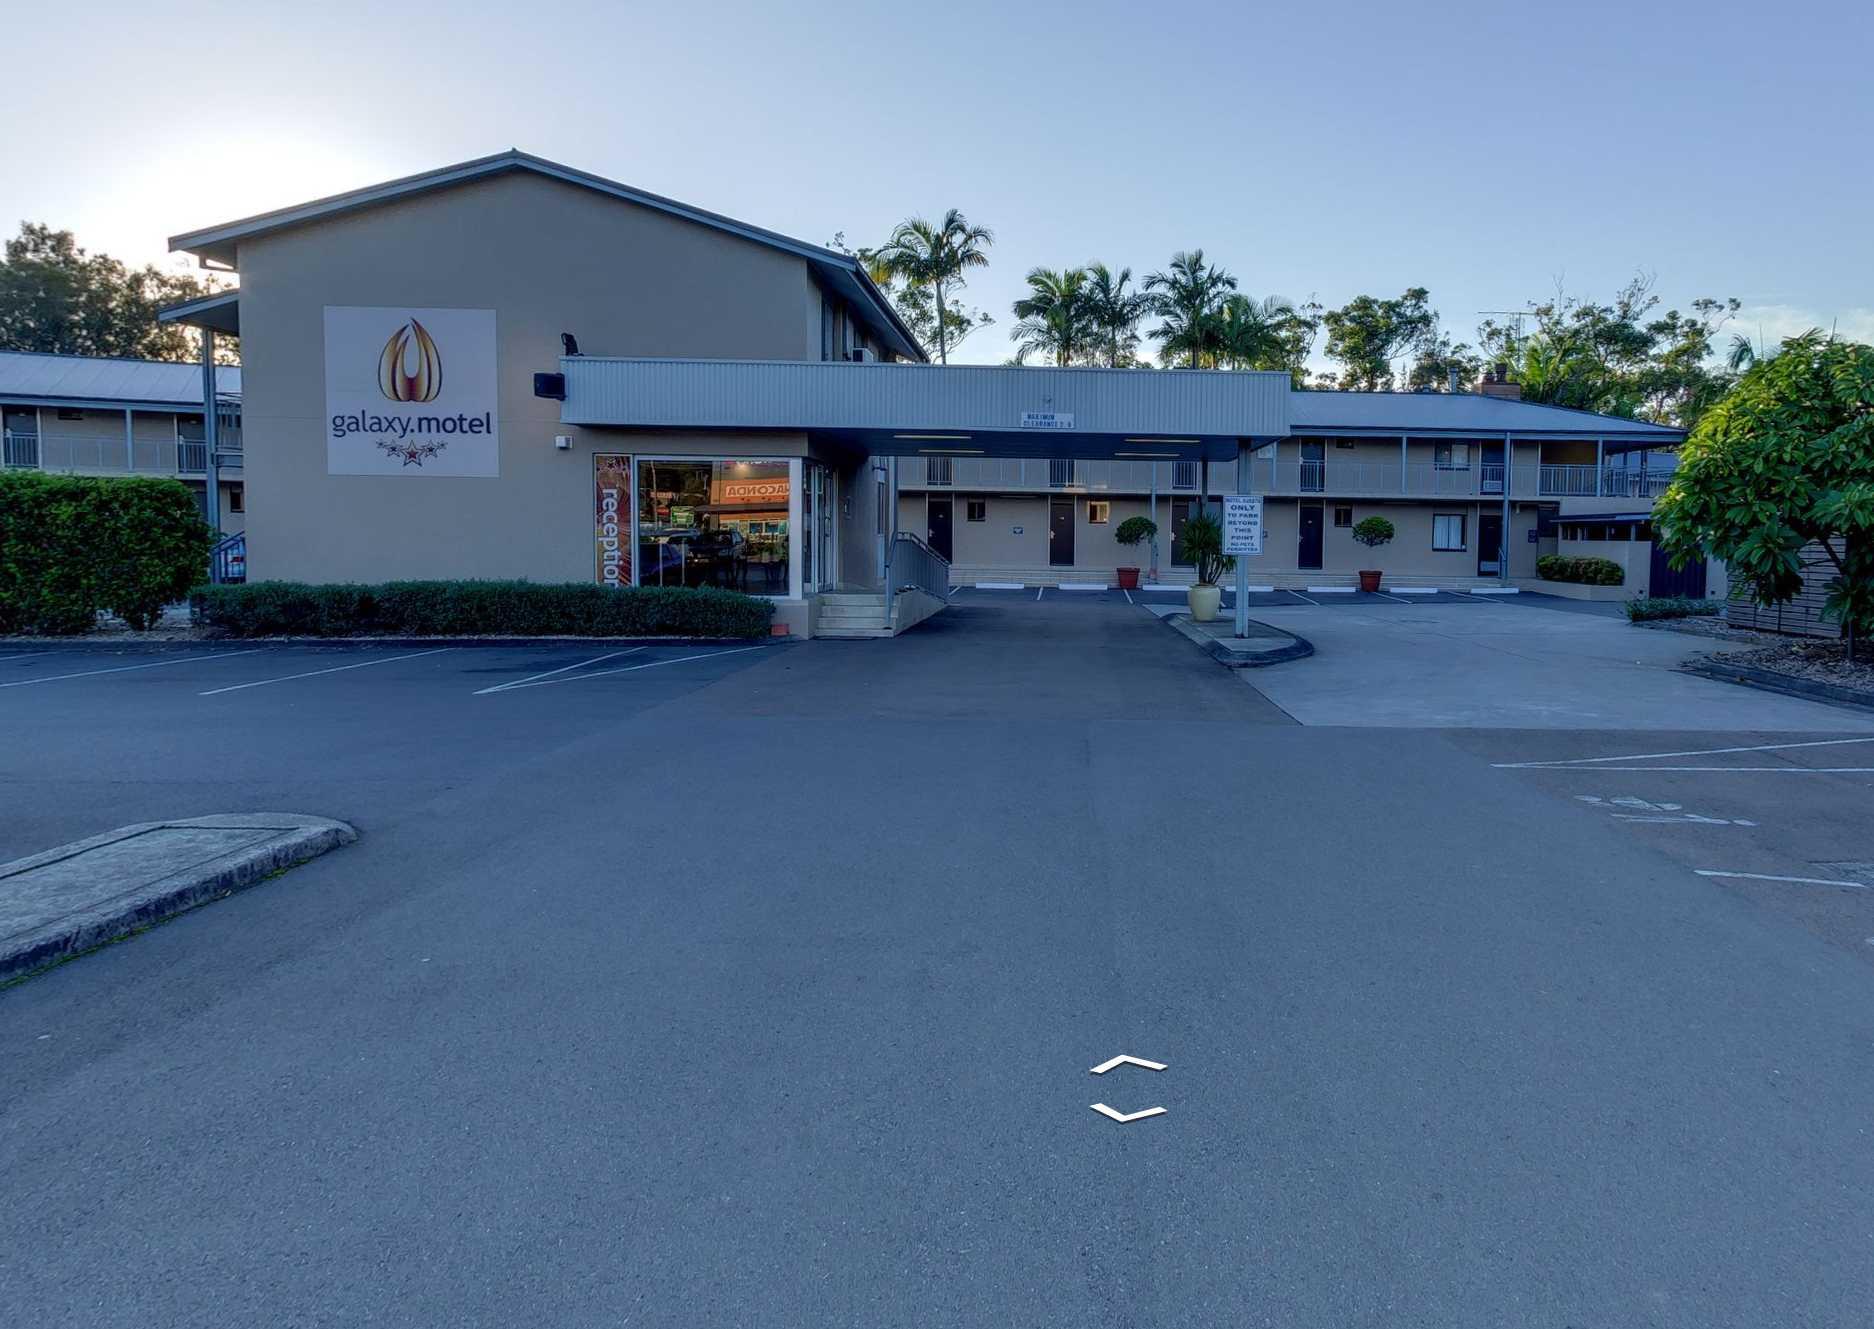 Custom Virtual Tour Of the Galaxy Motel, West Gosford NSW